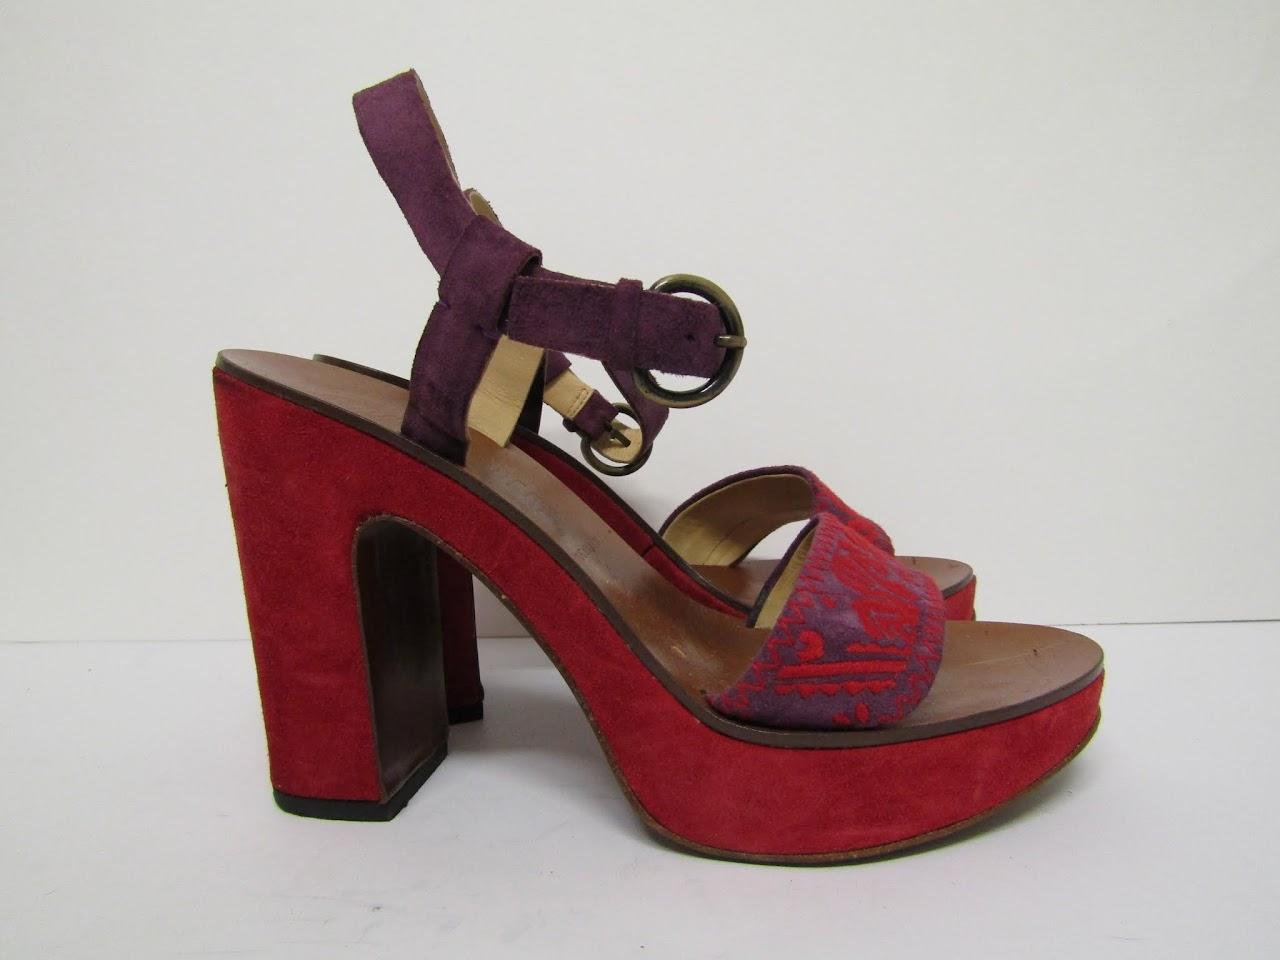 Miu Miu Boho Shoes